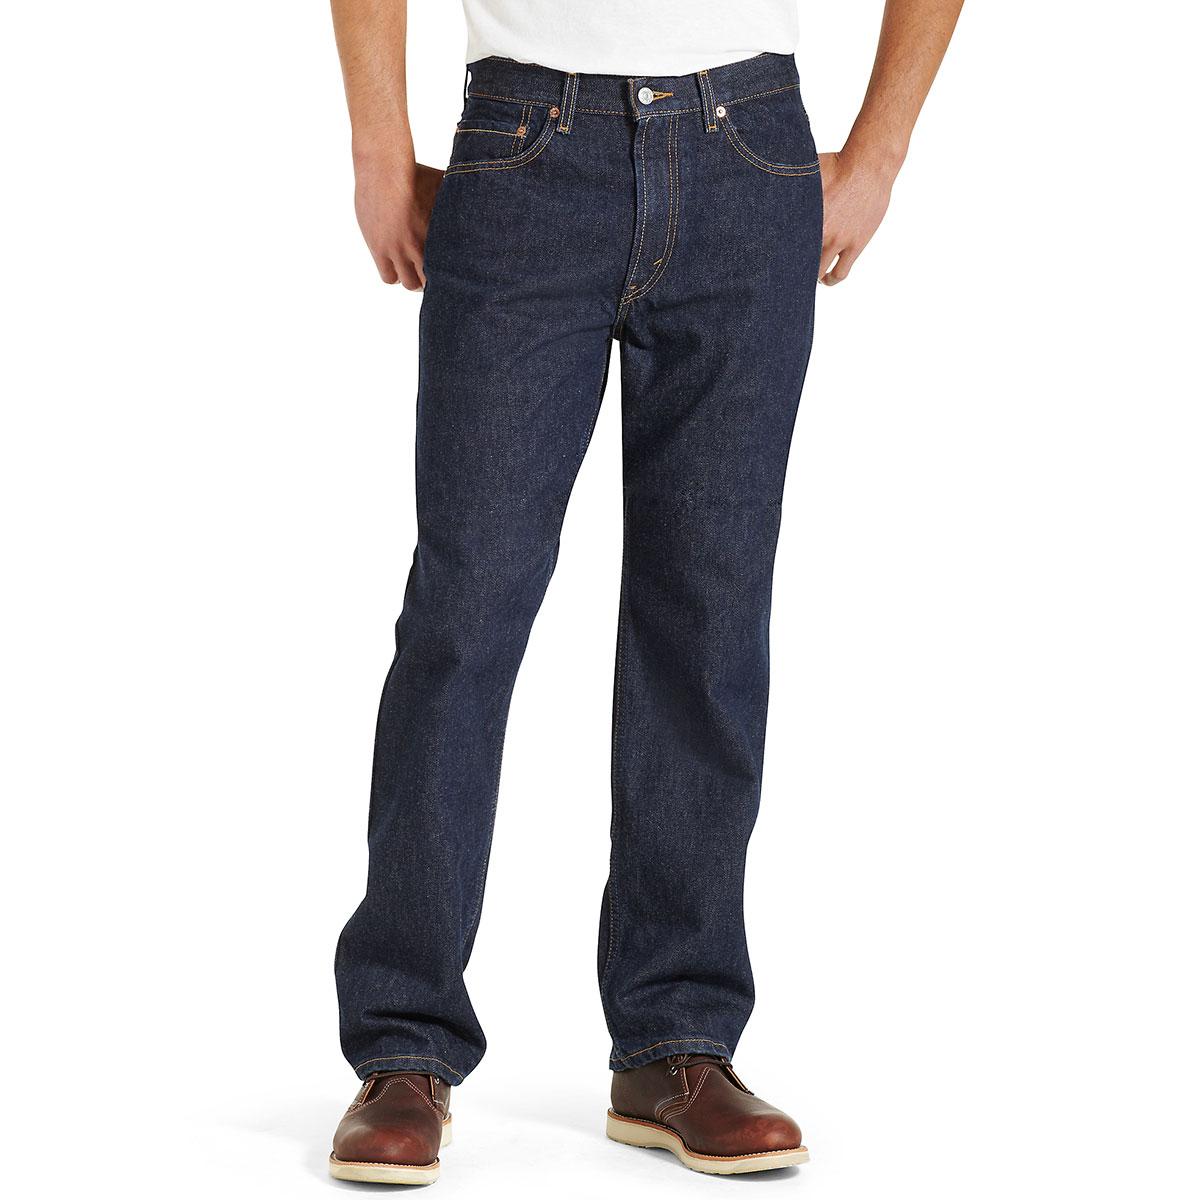 Levi's Men's 505 Regular Fit Jeans - Blue, 34/29